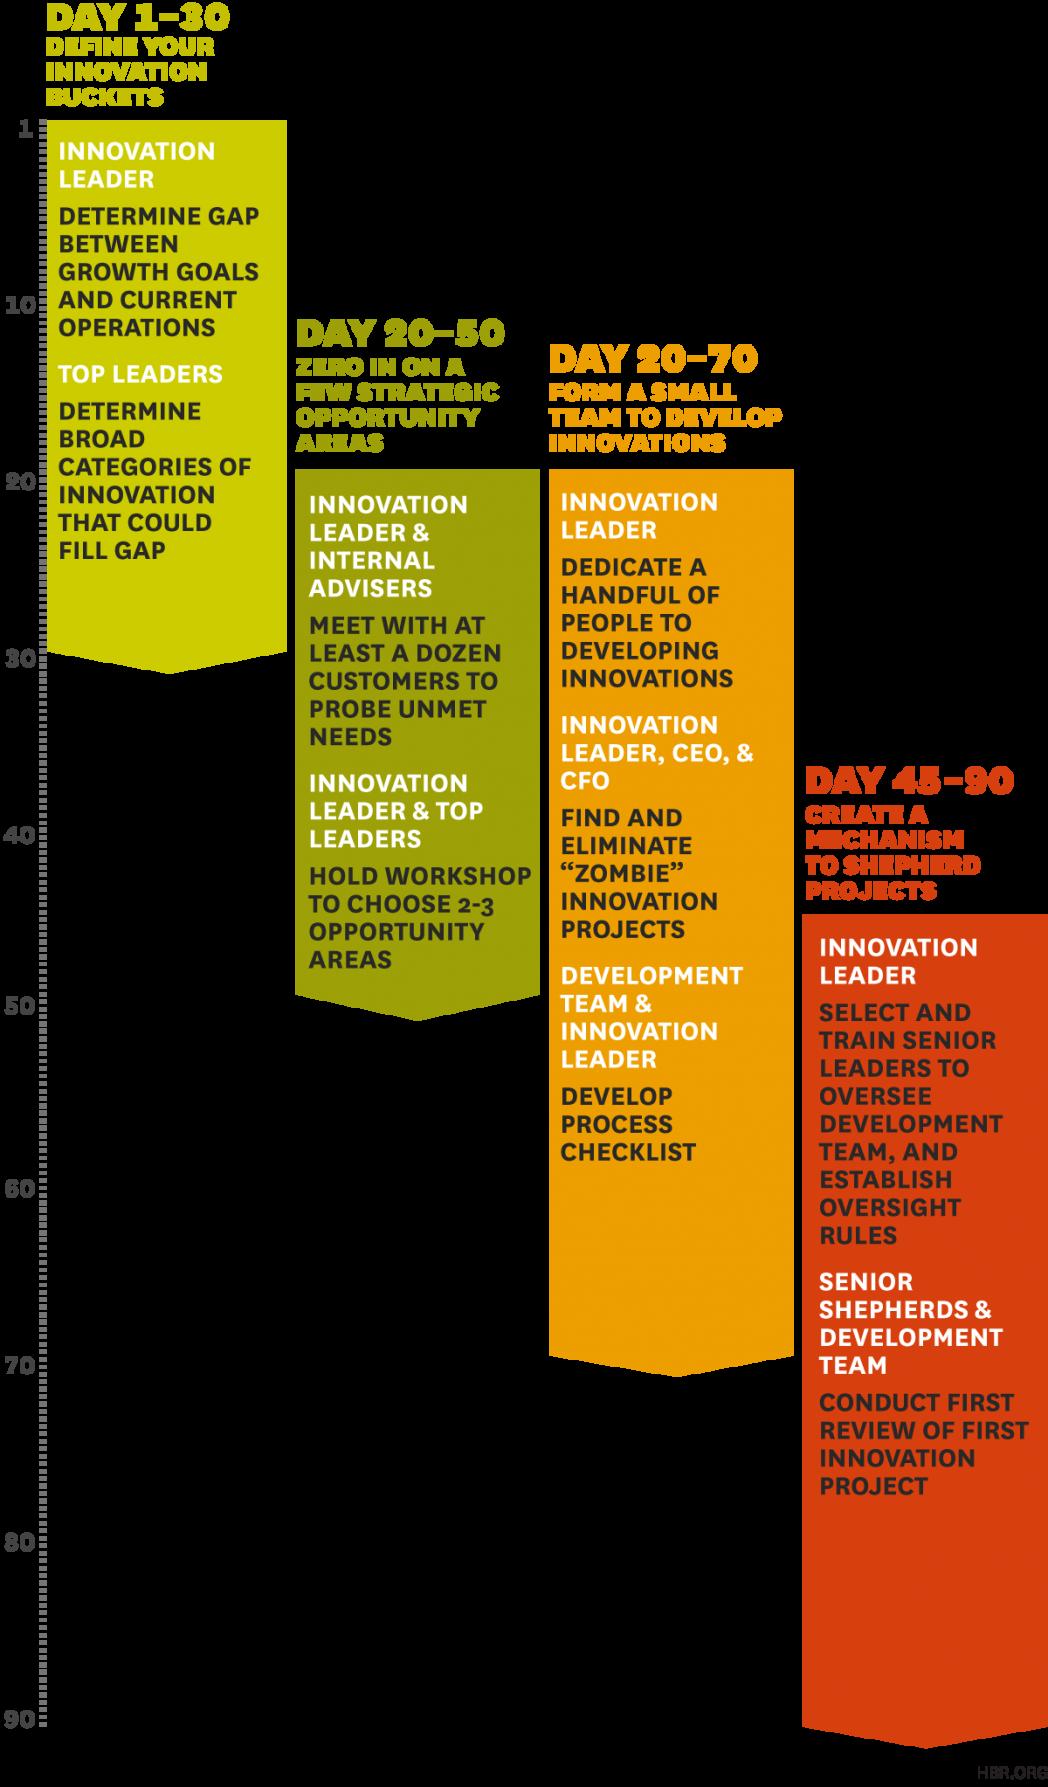 Planning clipart strategic goal. Creativity innovationas business solutions